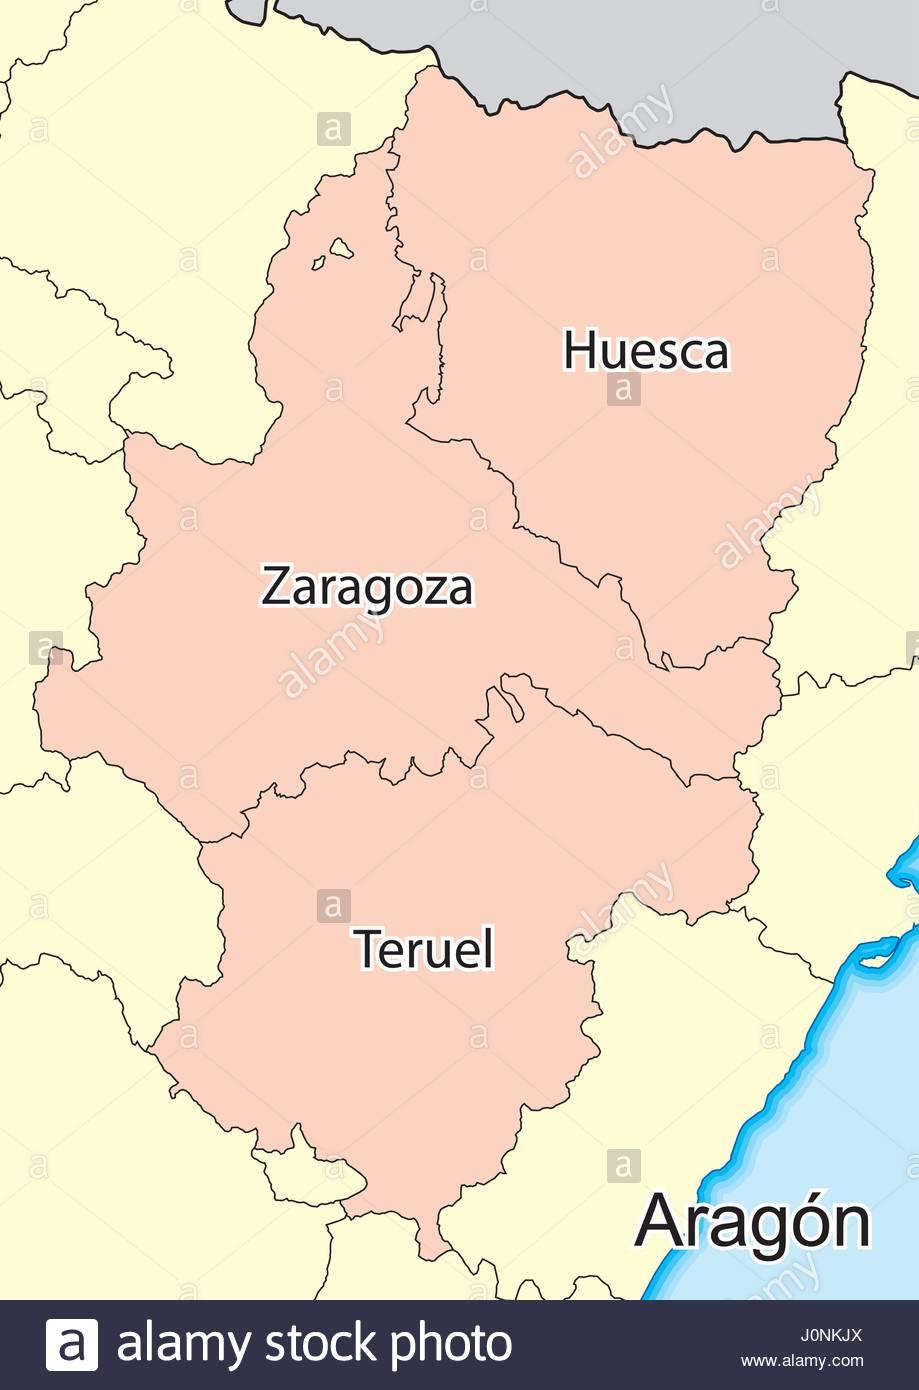 Vector map of the autonomous community of Aragon Spain Elements of